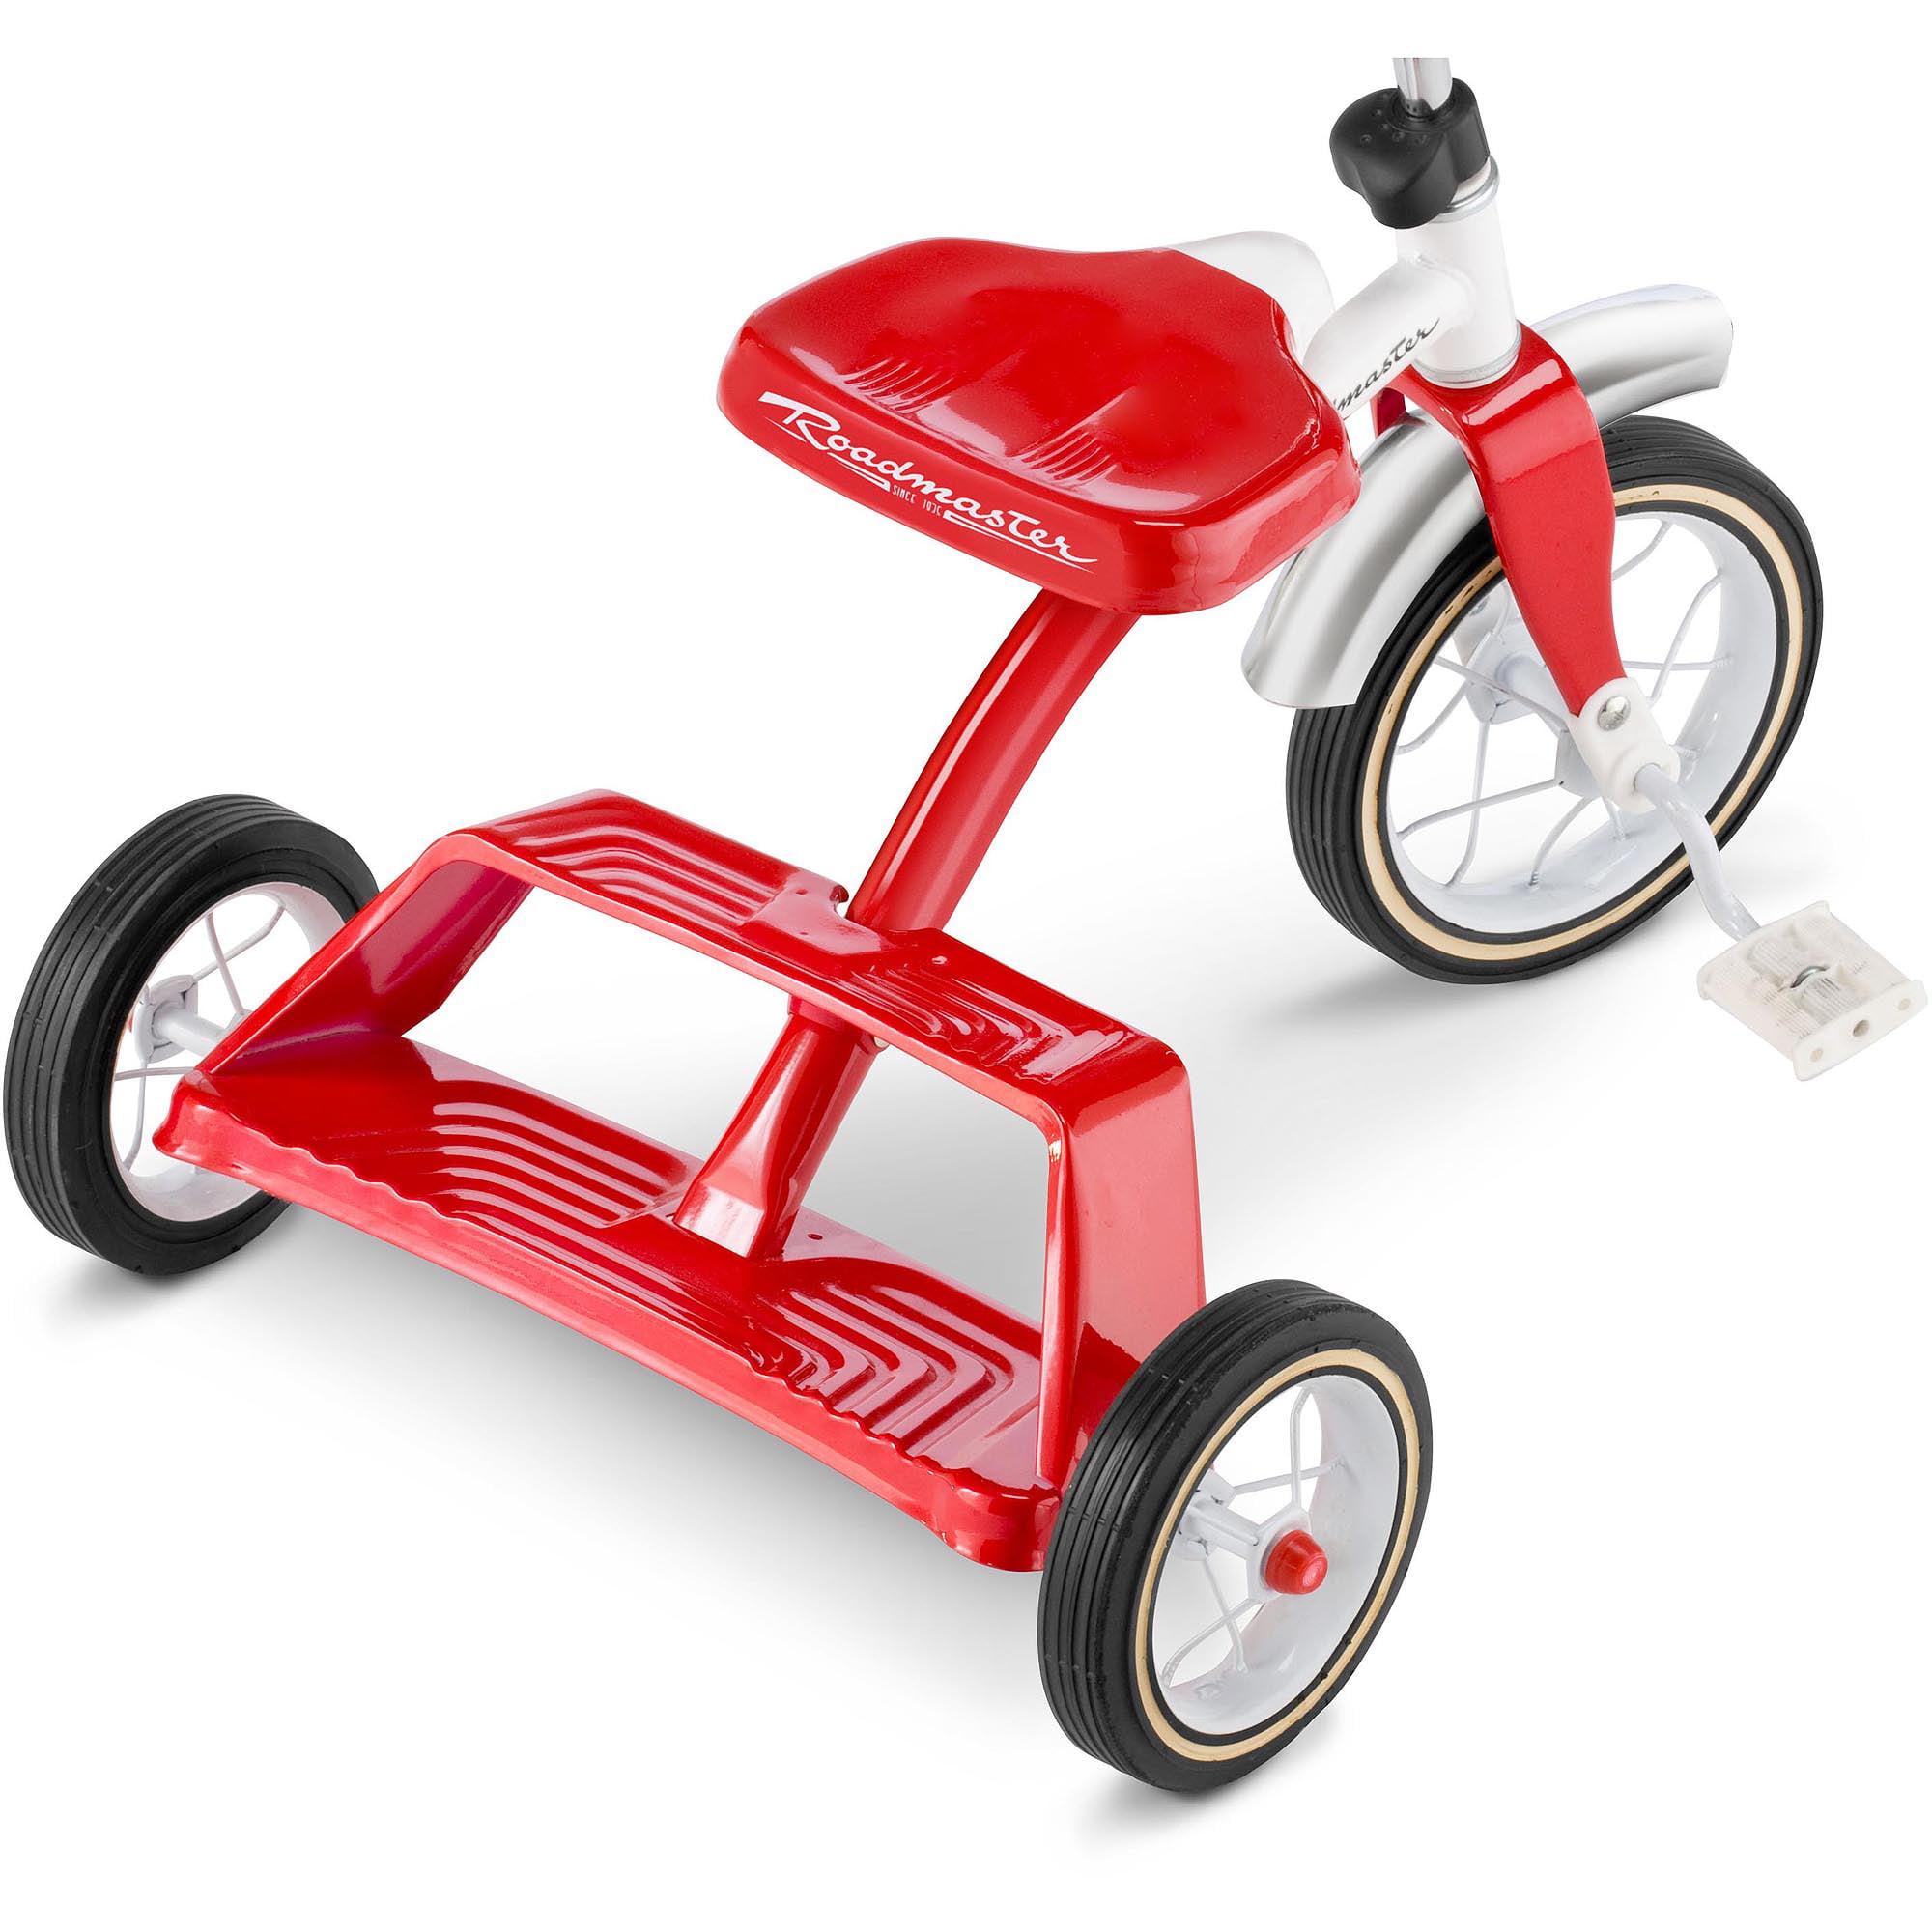 Roadmaster Dual Deck 10-Inch Trike